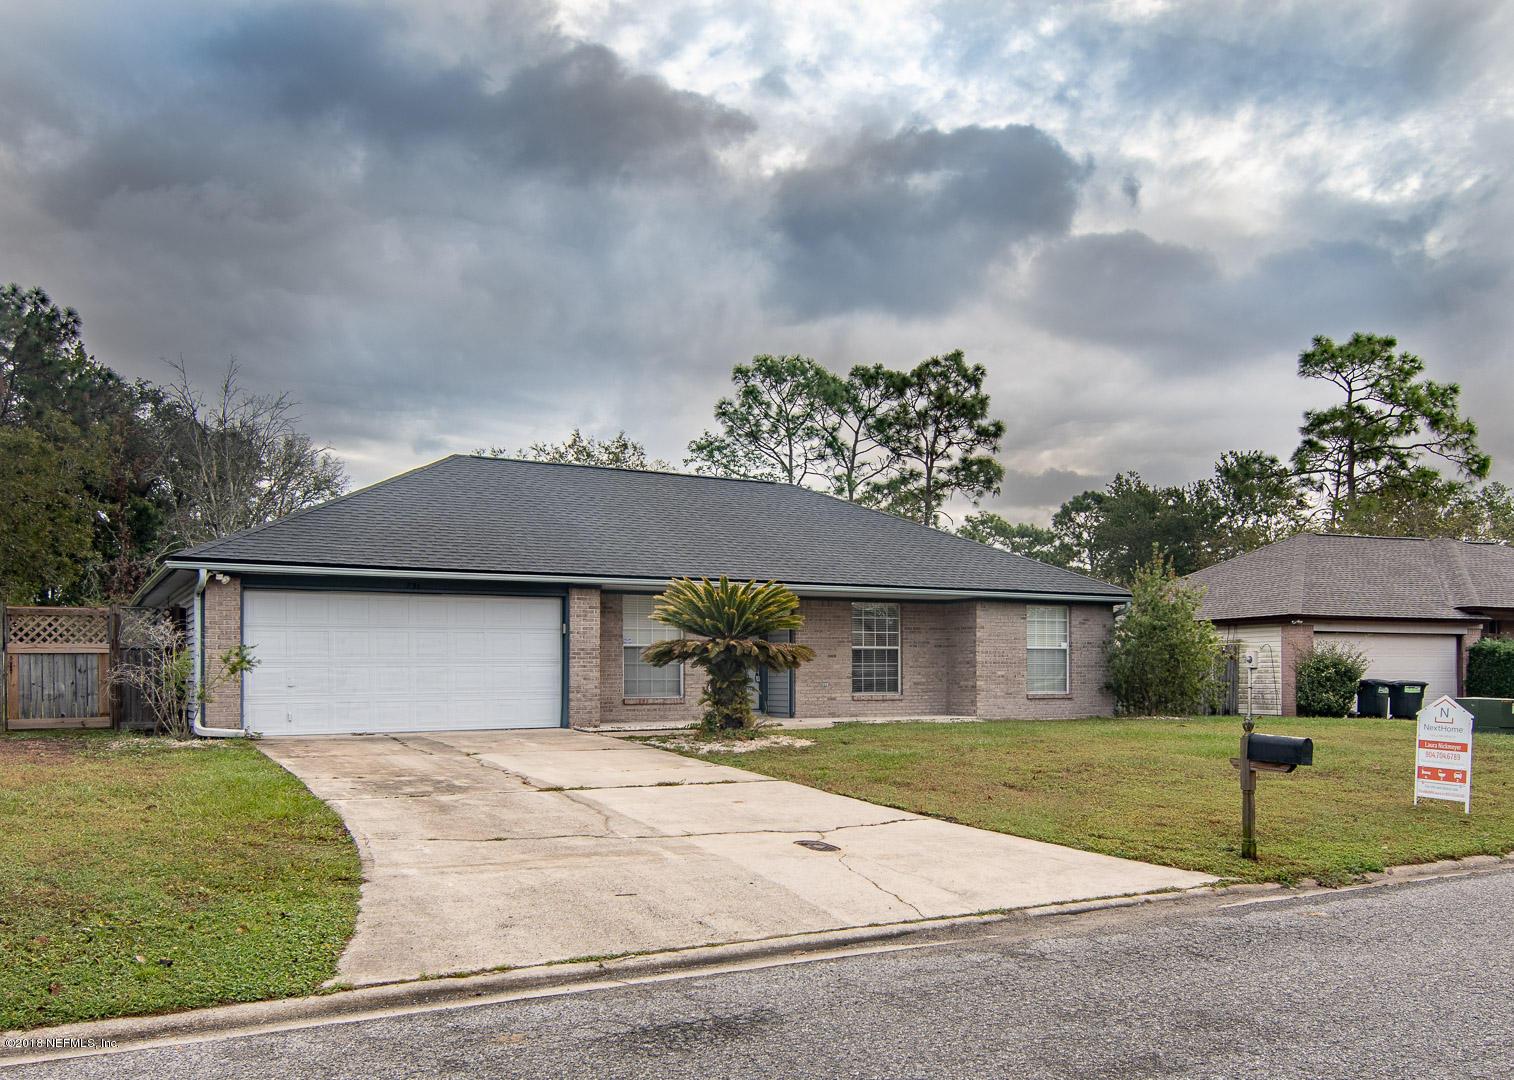 751 SANDLEWOOD, ORANGE PARK, FLORIDA 32065, 4 Bedrooms Bedrooms, ,2 BathroomsBathrooms,Residential - single family,For sale,SANDLEWOOD,964295